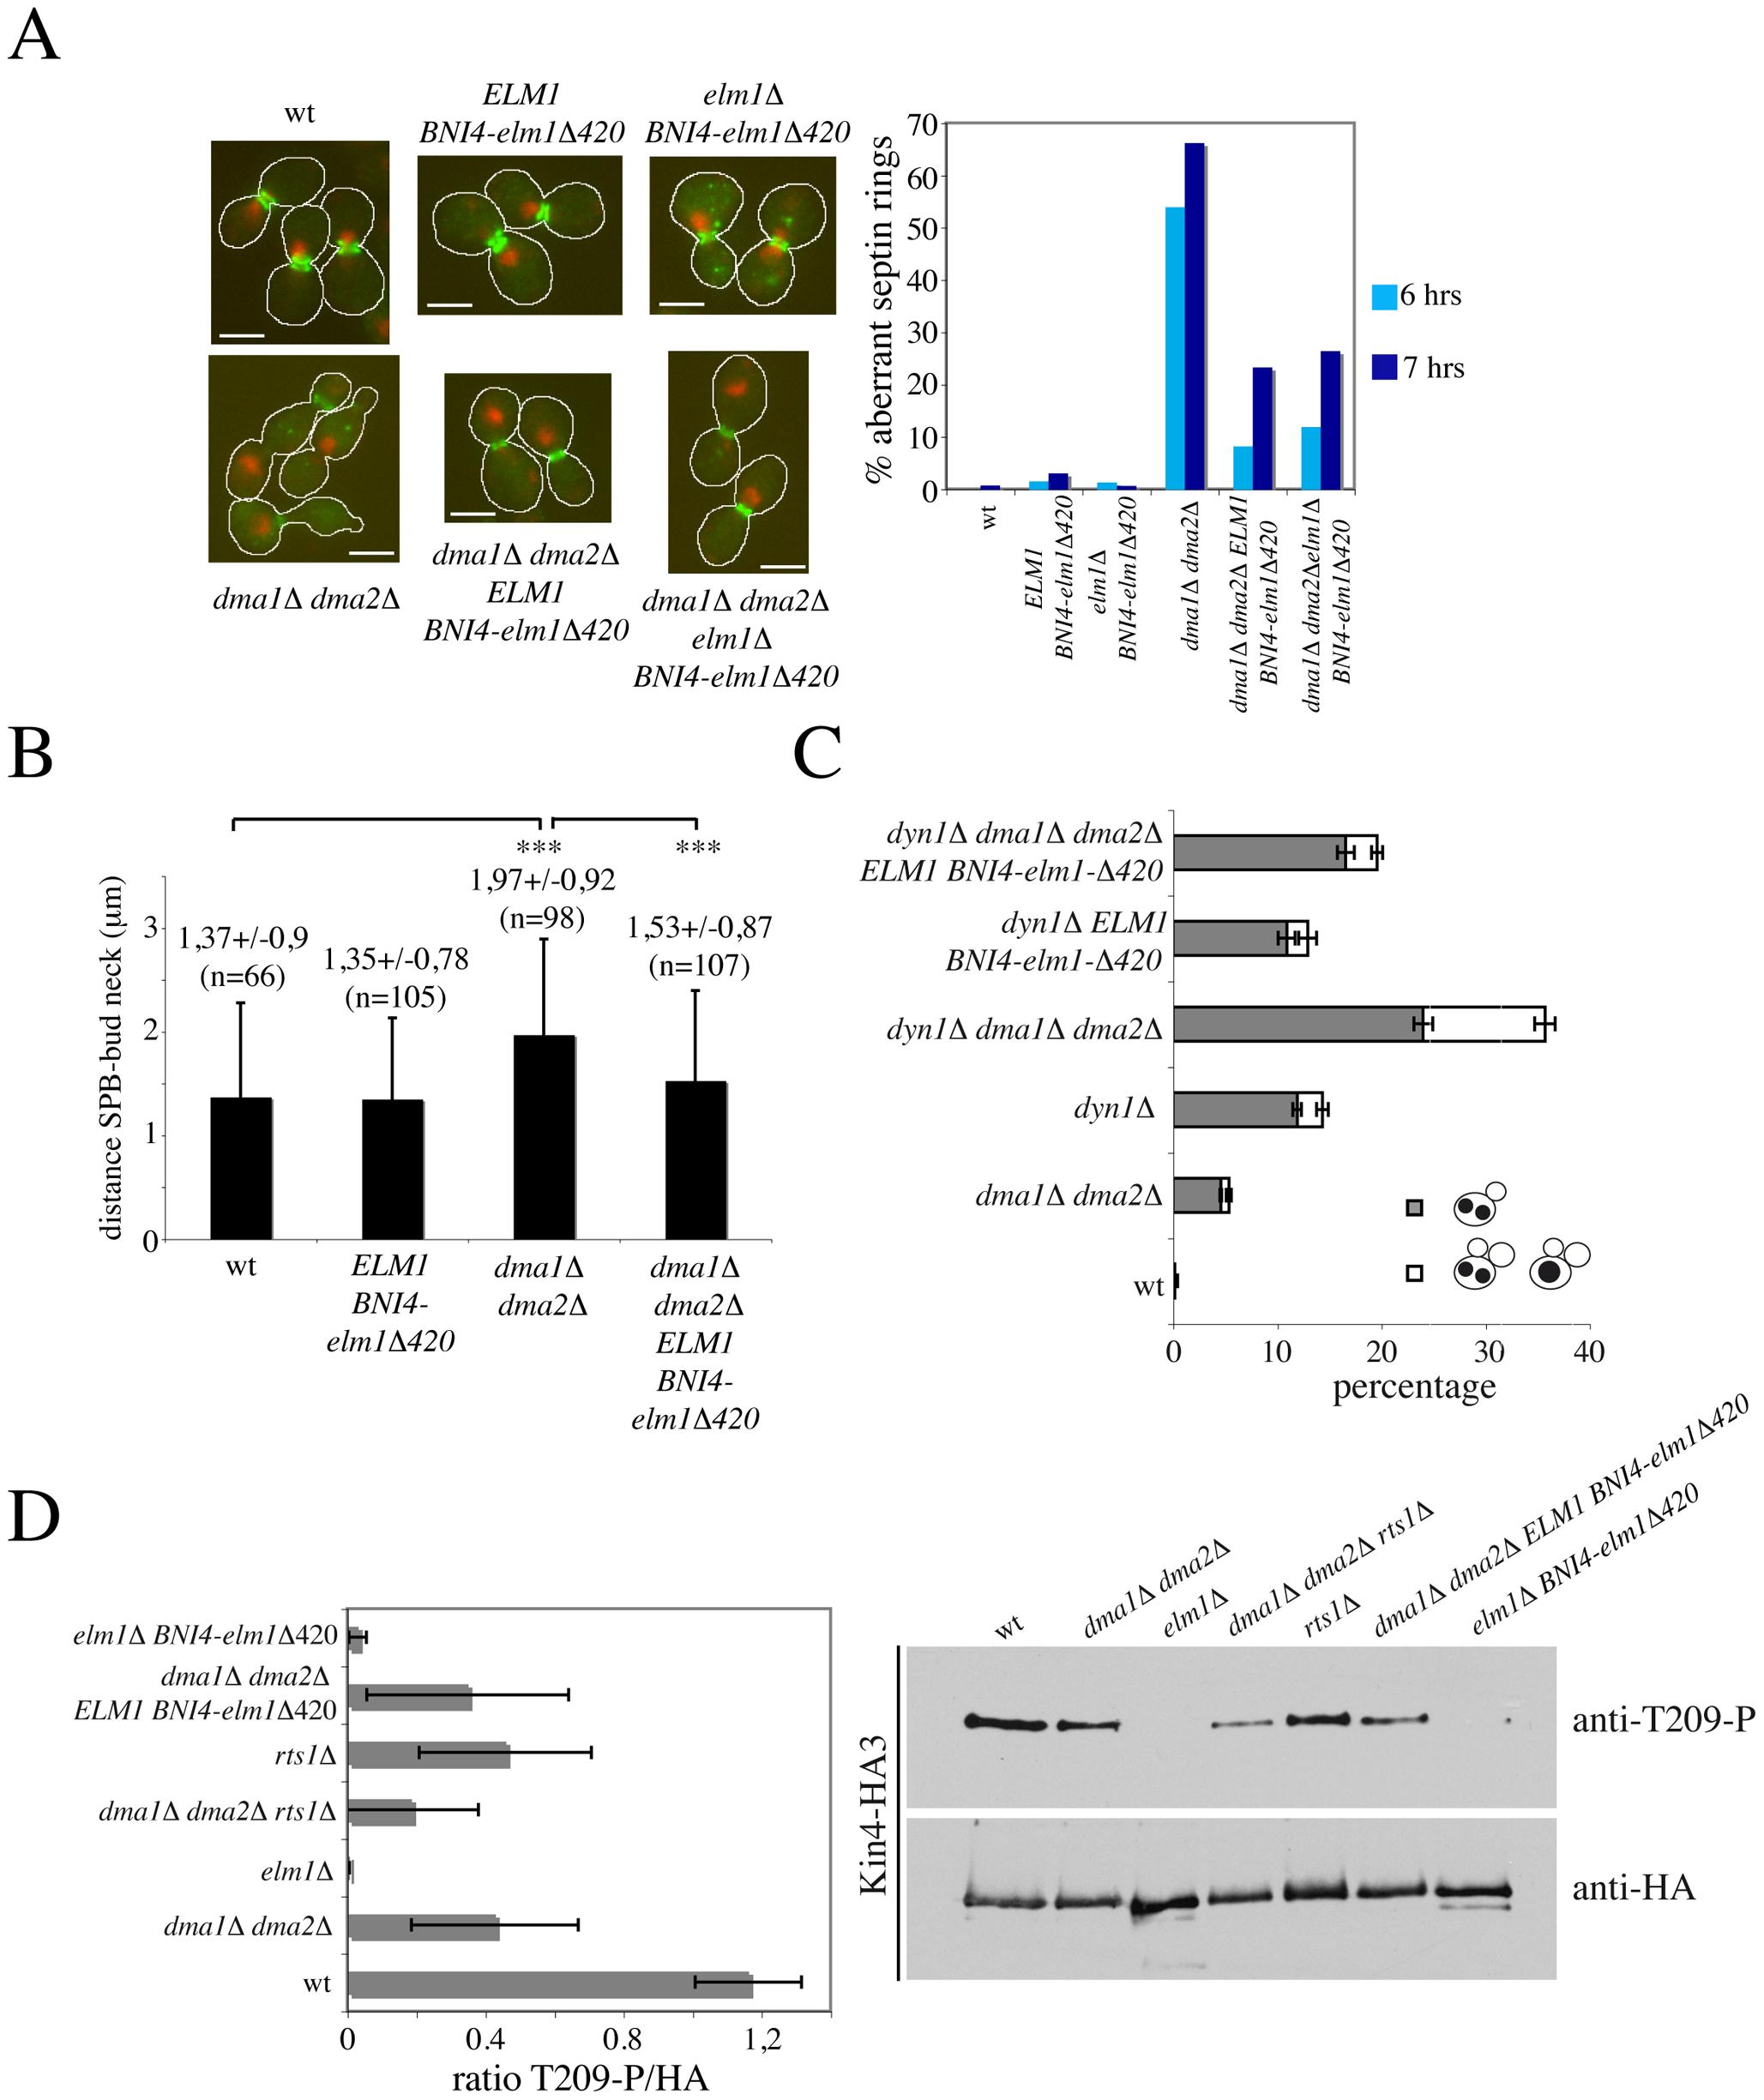 Restoring Elm1 localization at the bud neck of <i>dma1Δ dma2Δ</i> cells rescues their septin and SPOC defects without restoring Kin4 phosphorylation.